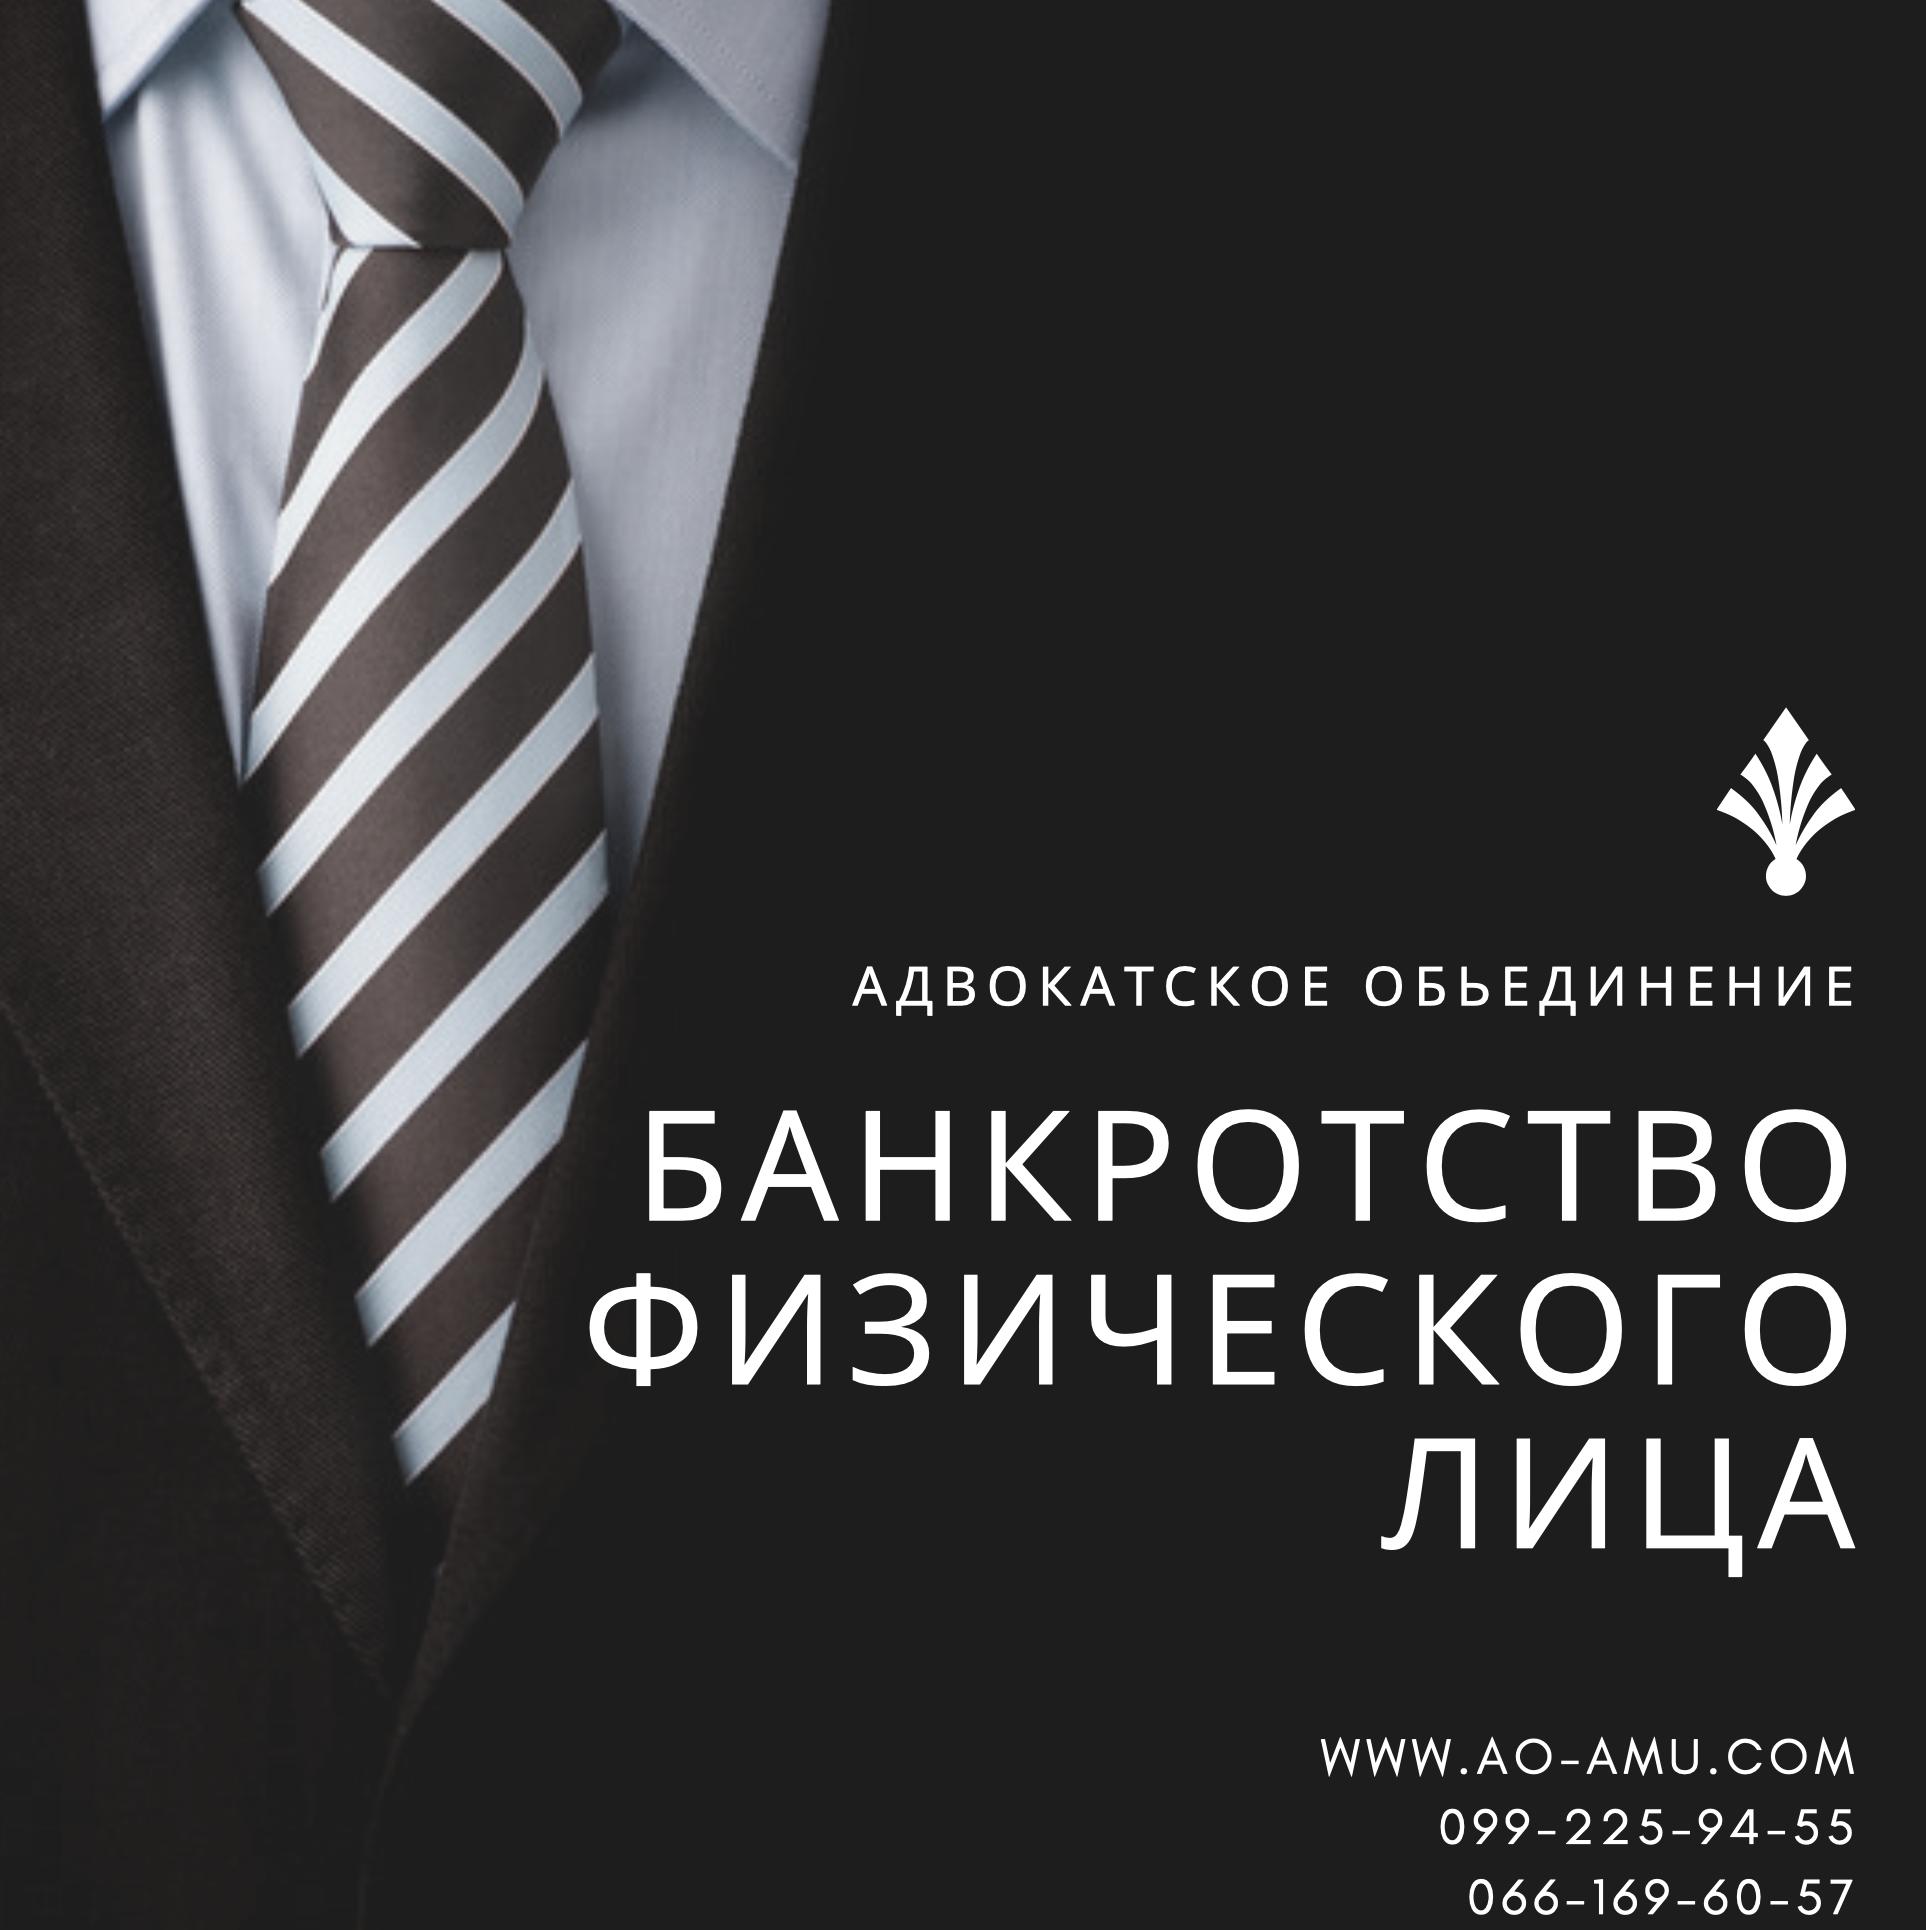 Фото БАНКРОТСТВО ФИЗИЧЕСКОГО ЛИЦА